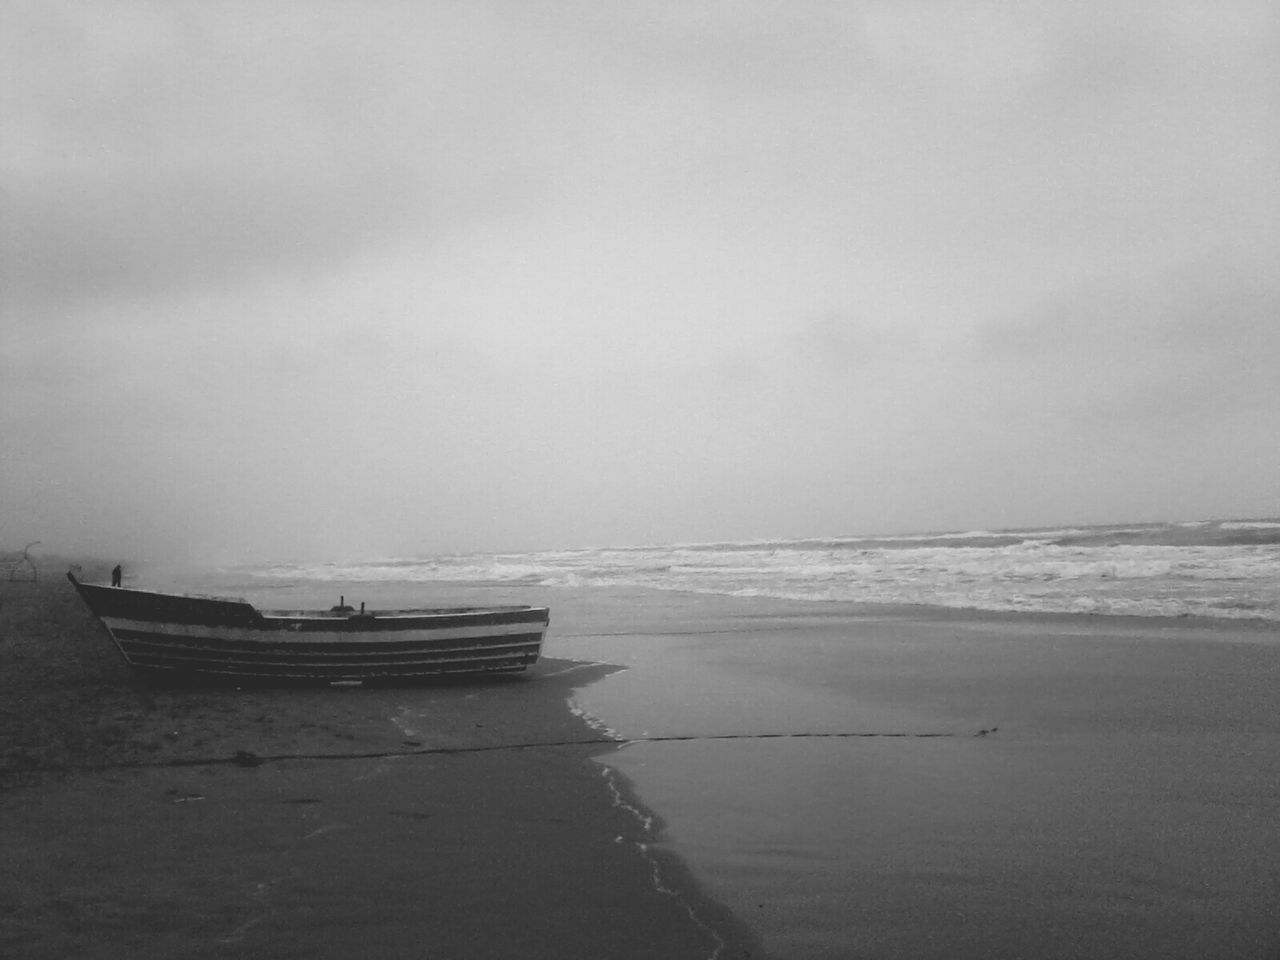 Lone Boat On Calm Beach Against The Sky